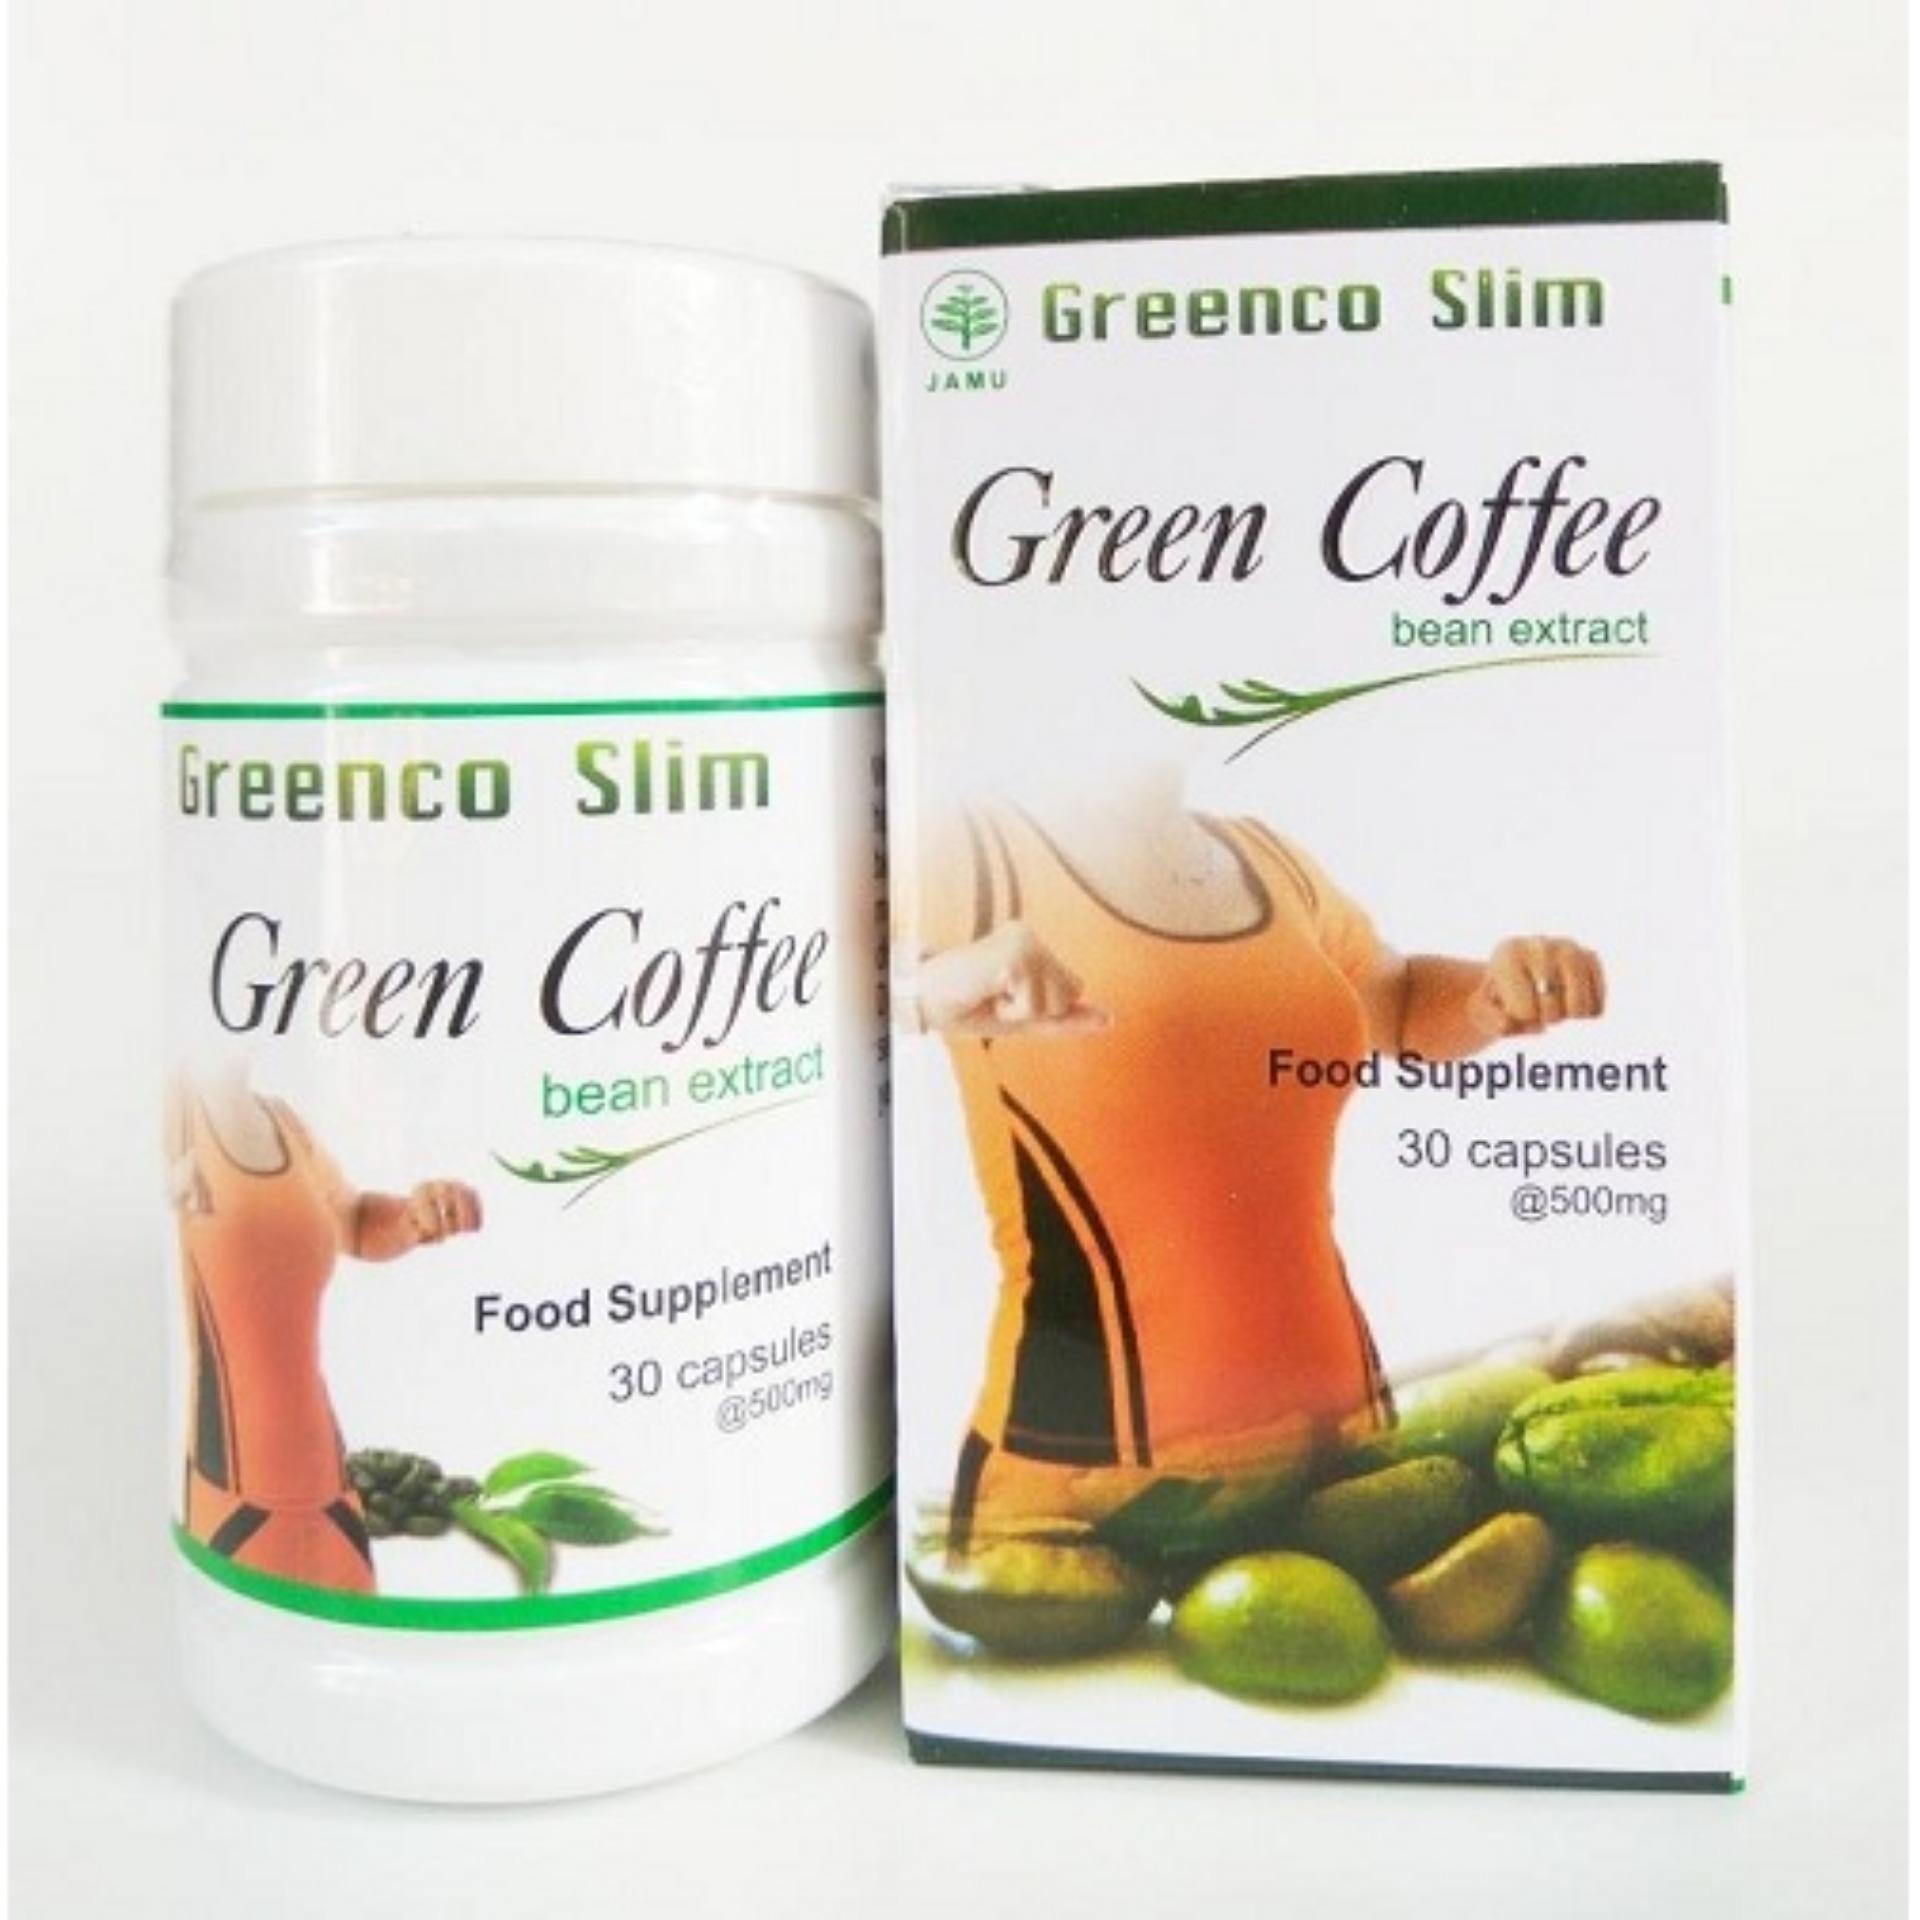 ... Greenco Slim Green Coffee Bean Extract - Isi 30 kapsul HendelExitox Leptin ...